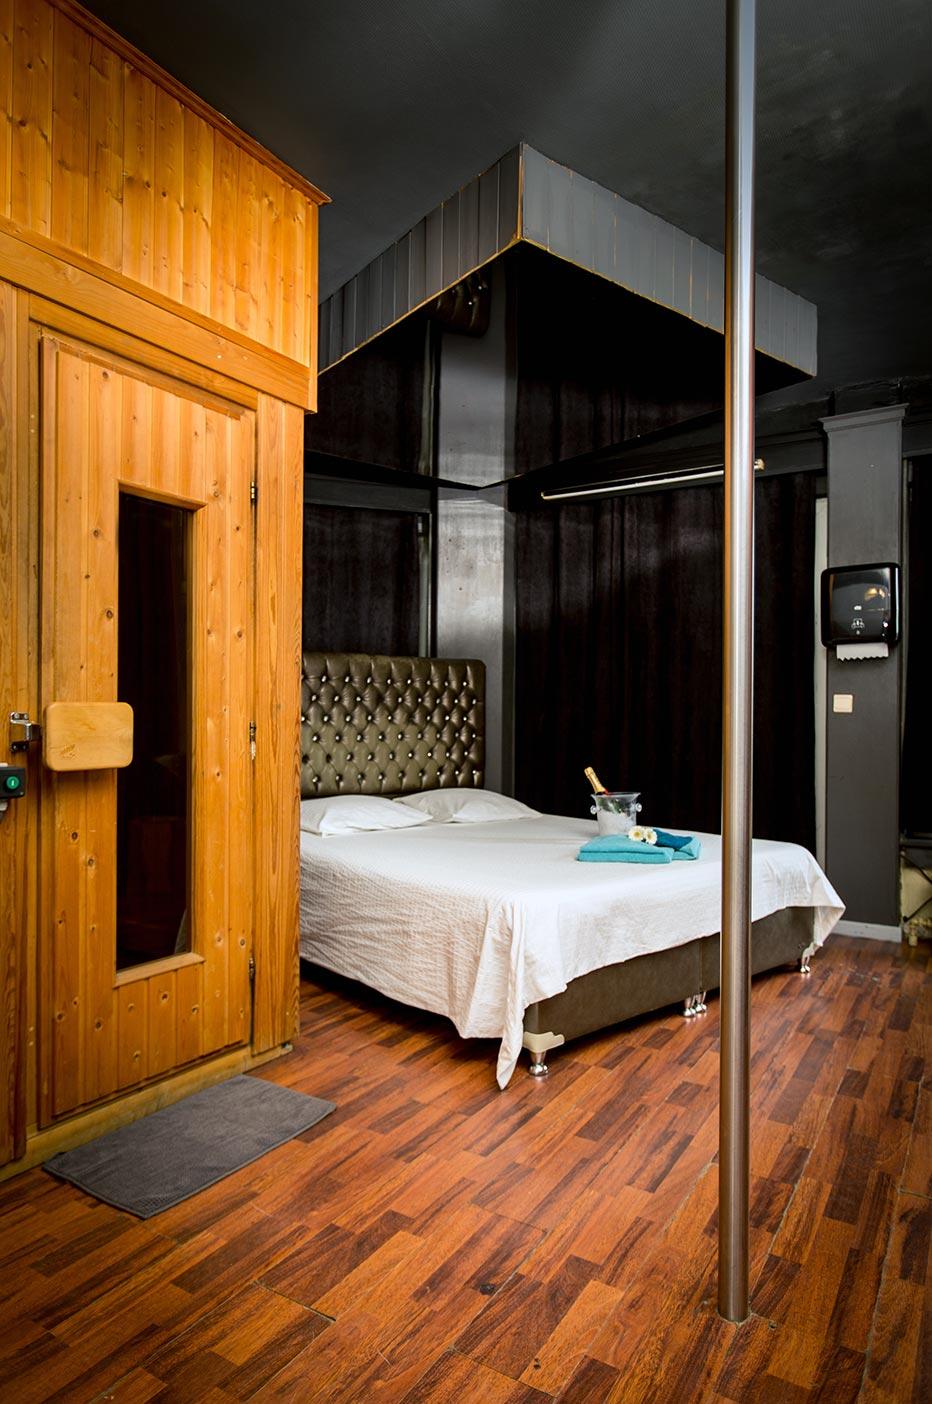 Ptitamie-rendezvous-hotelkamer-3.jpg